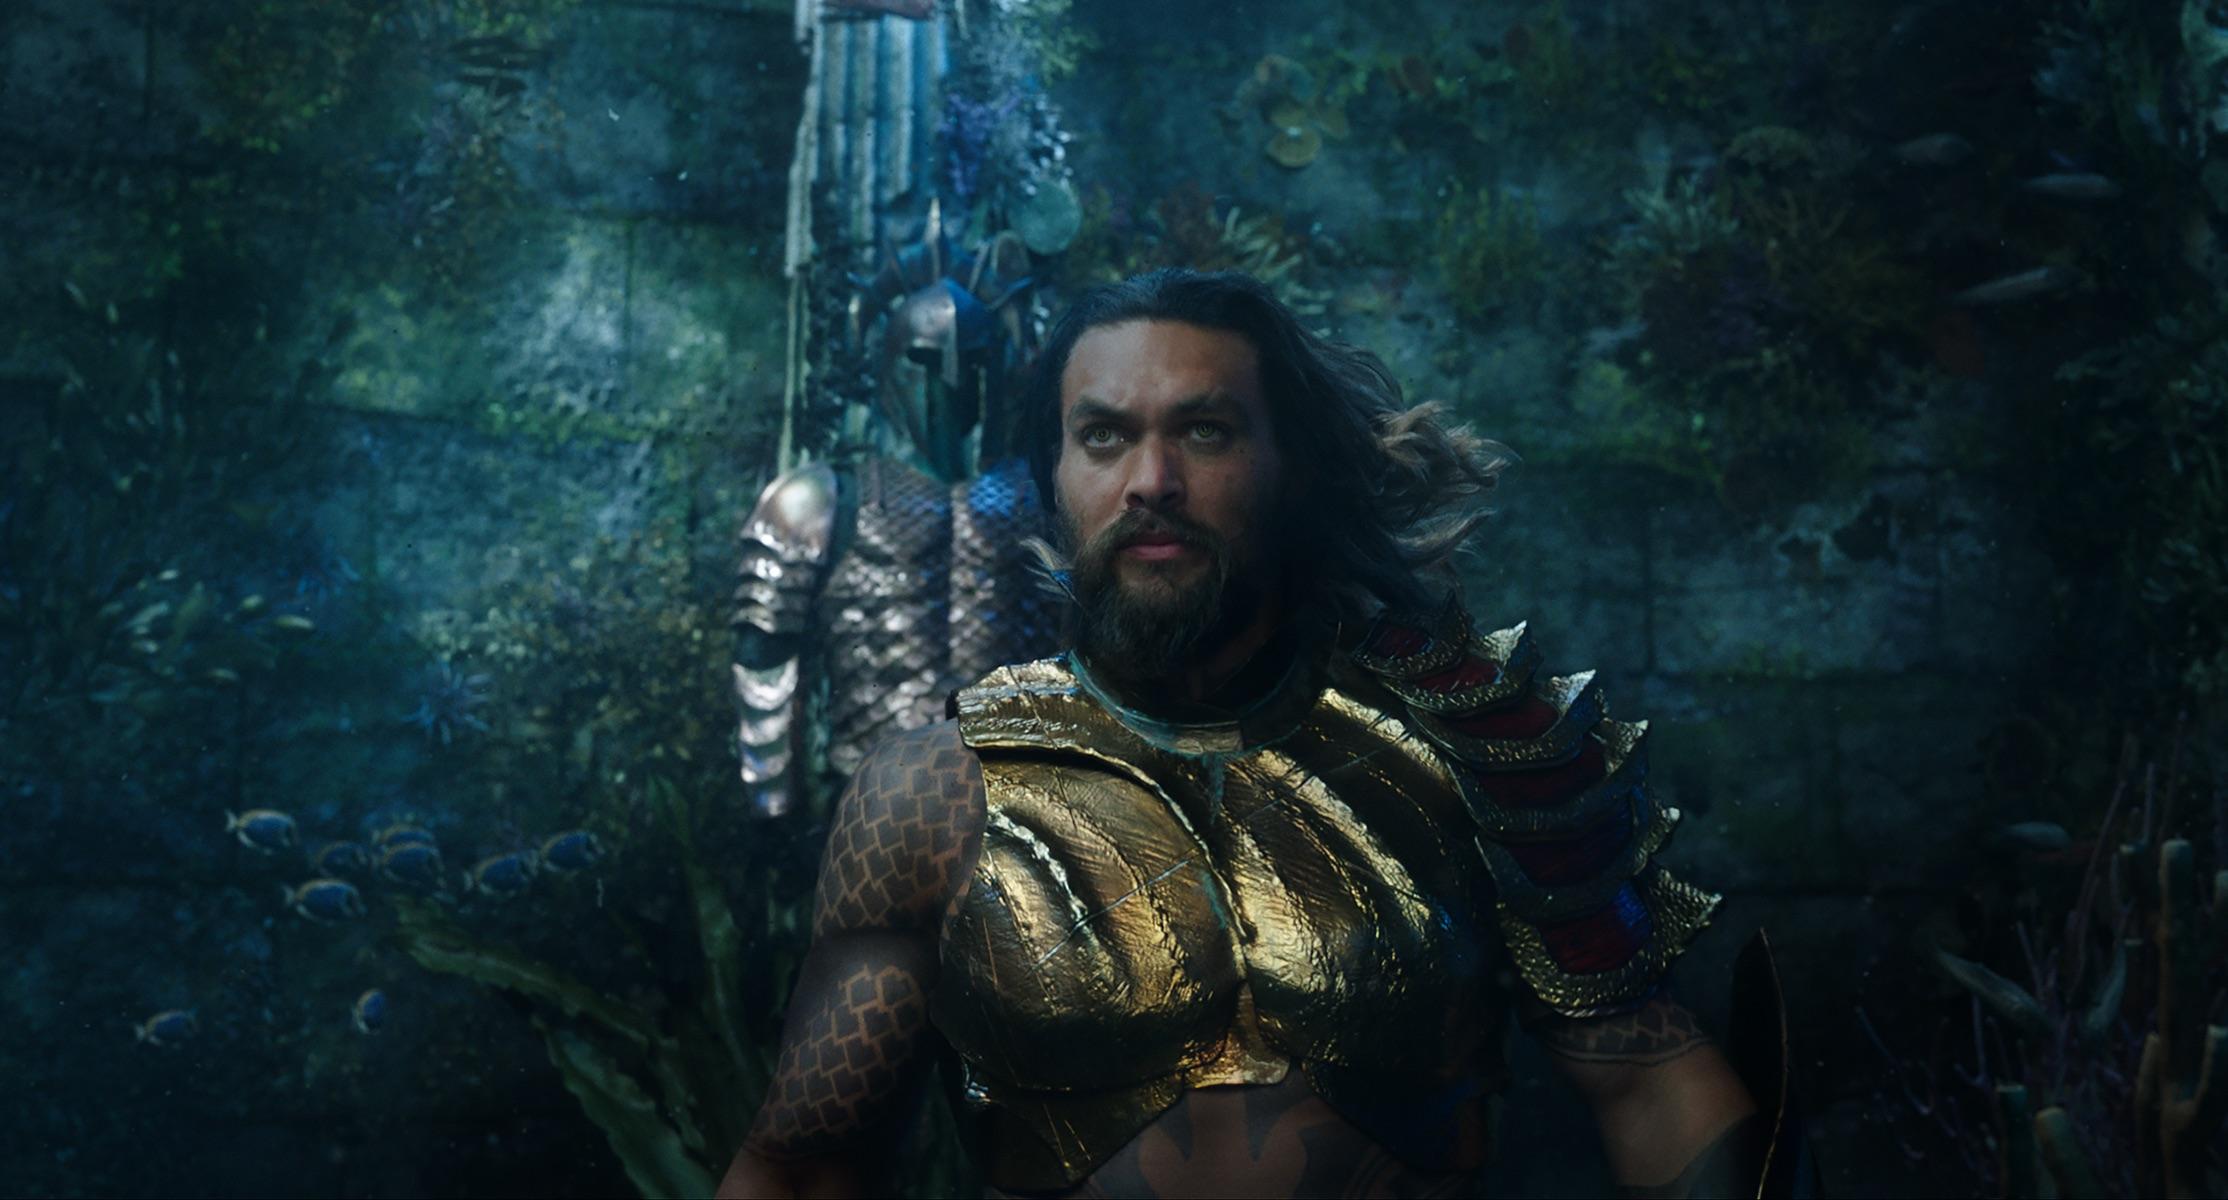 Jason Momoa plays the title role in  Aquaman.